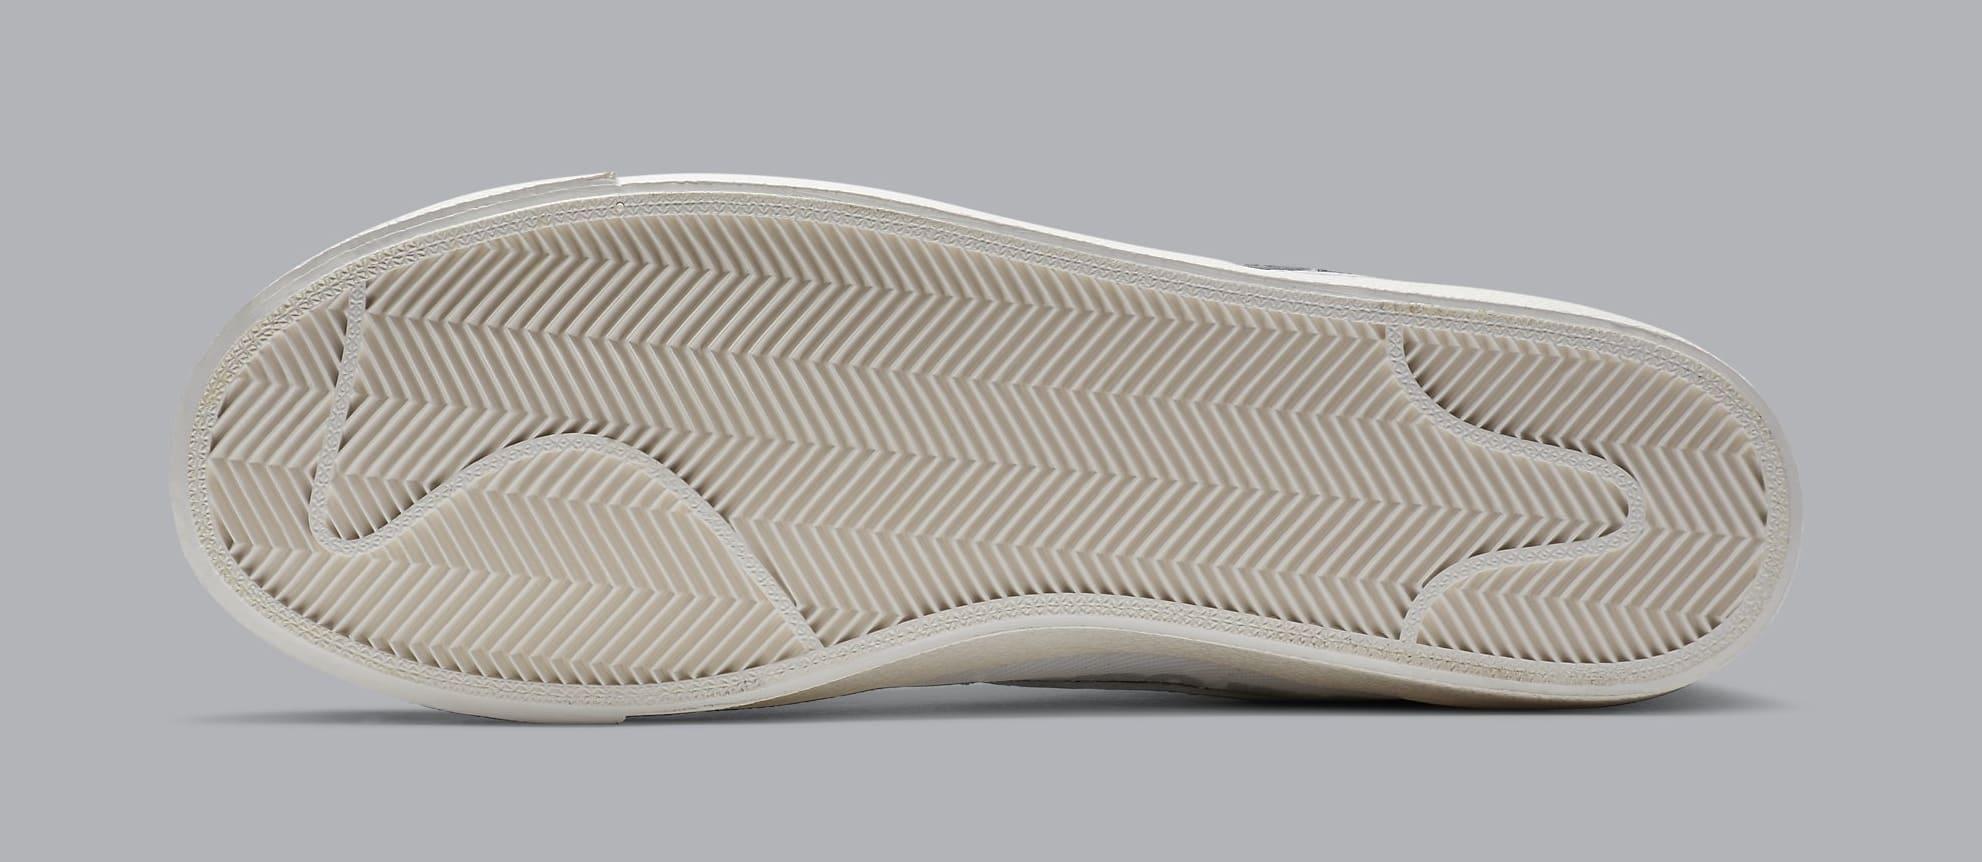 Comme des Garcons x Naomi Osaka x Nike Blazer Mid DA5383-100 Outsole